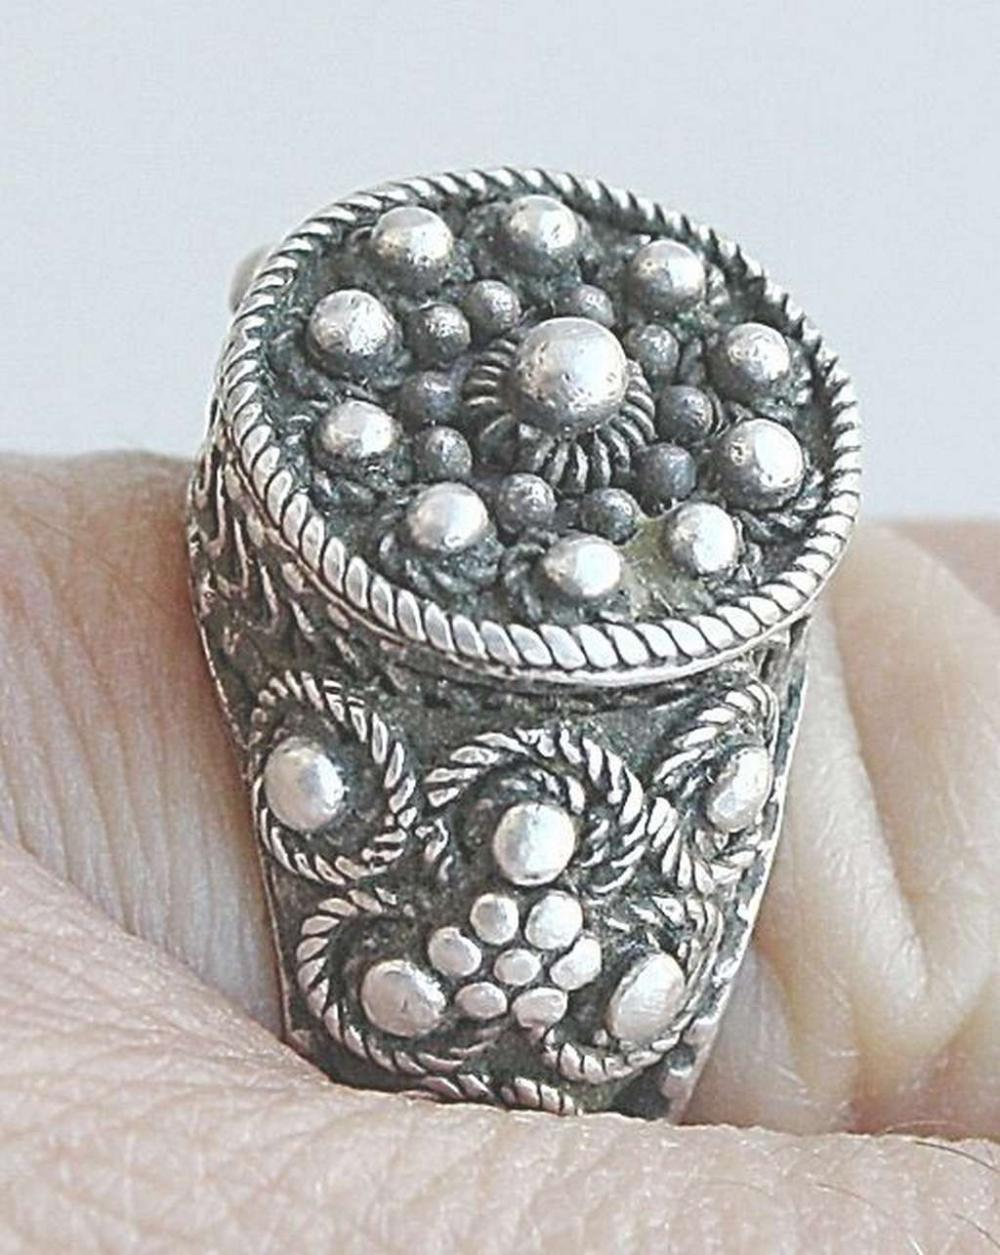 Yemenite antique filigree silver sterling jewish wedding ring, size: 7,